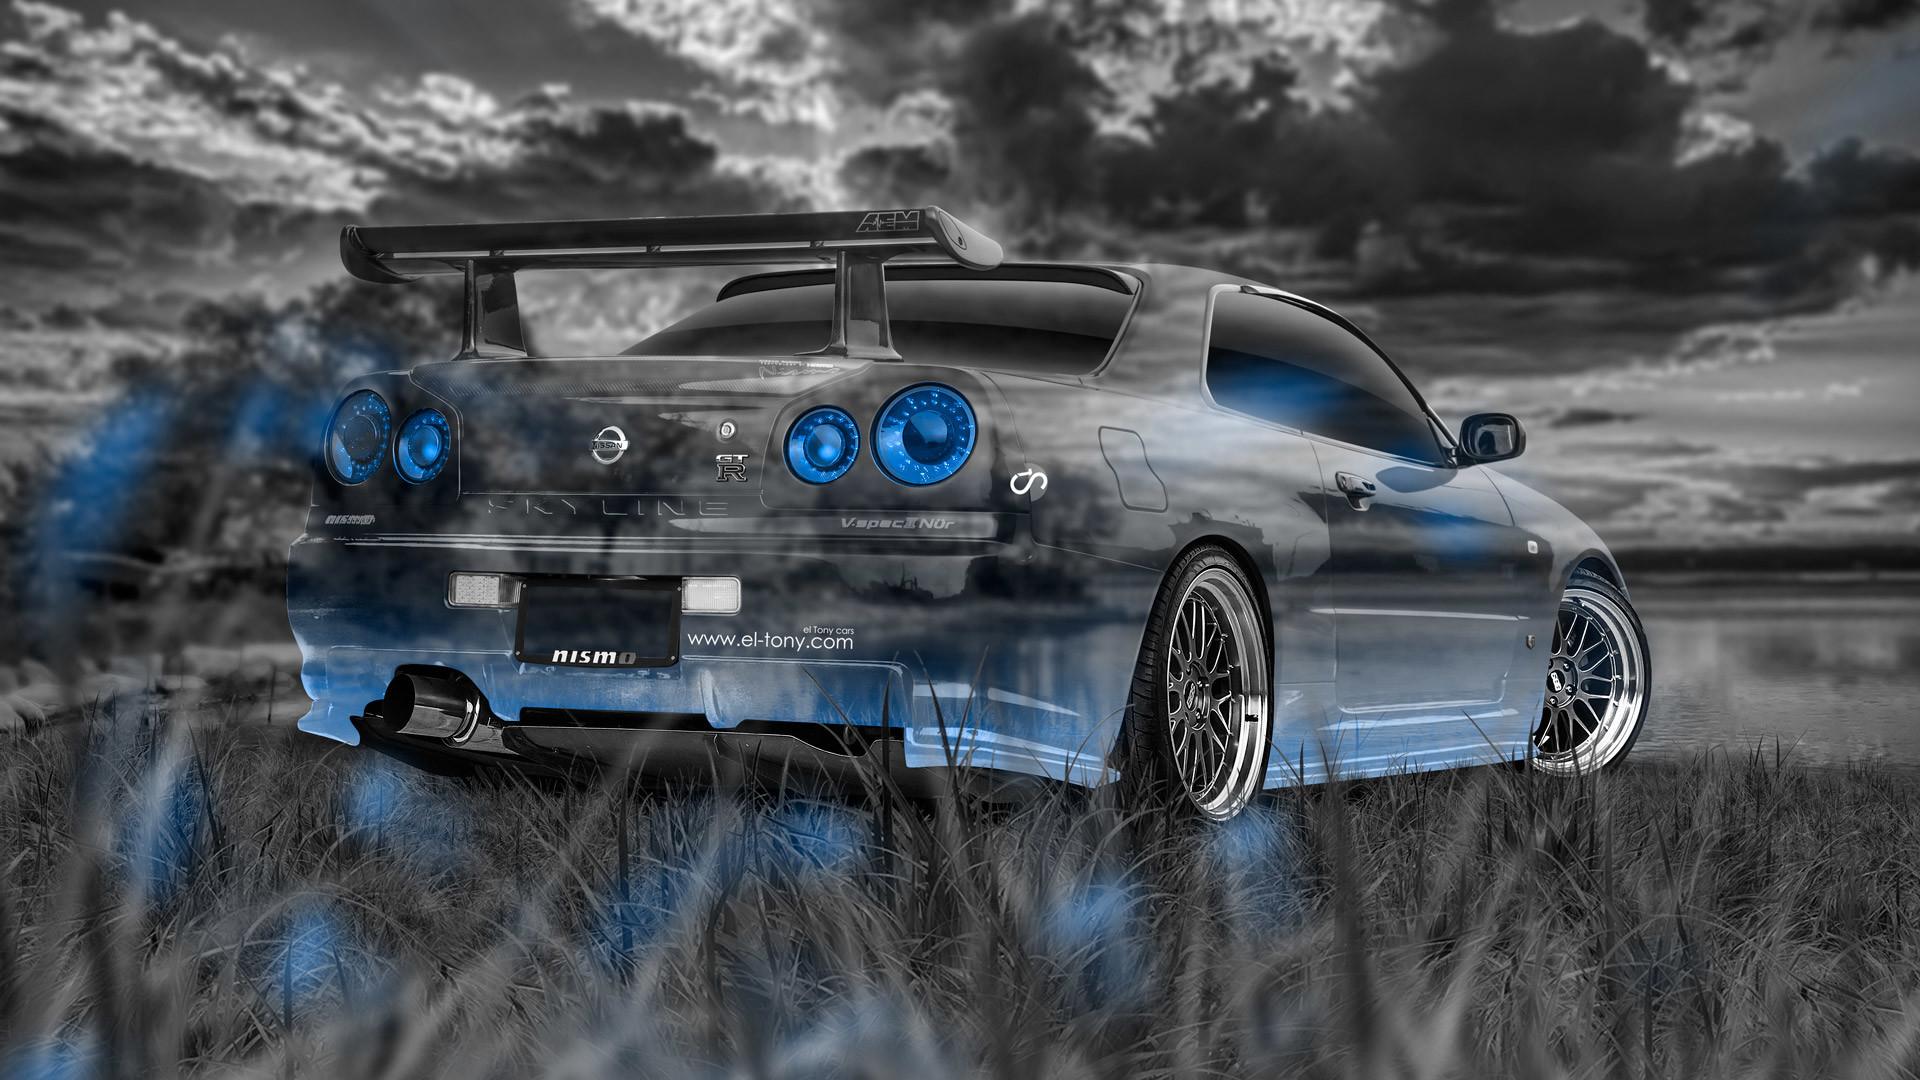 Nissan gtr godzilla clipart ClipartFox 1600×1200 Nissan Skyline GTR R34  Wallpapers (51 Wallpapers) | Adorable Wallpapers | Wallpapers | Pinterest |  Godzilla …